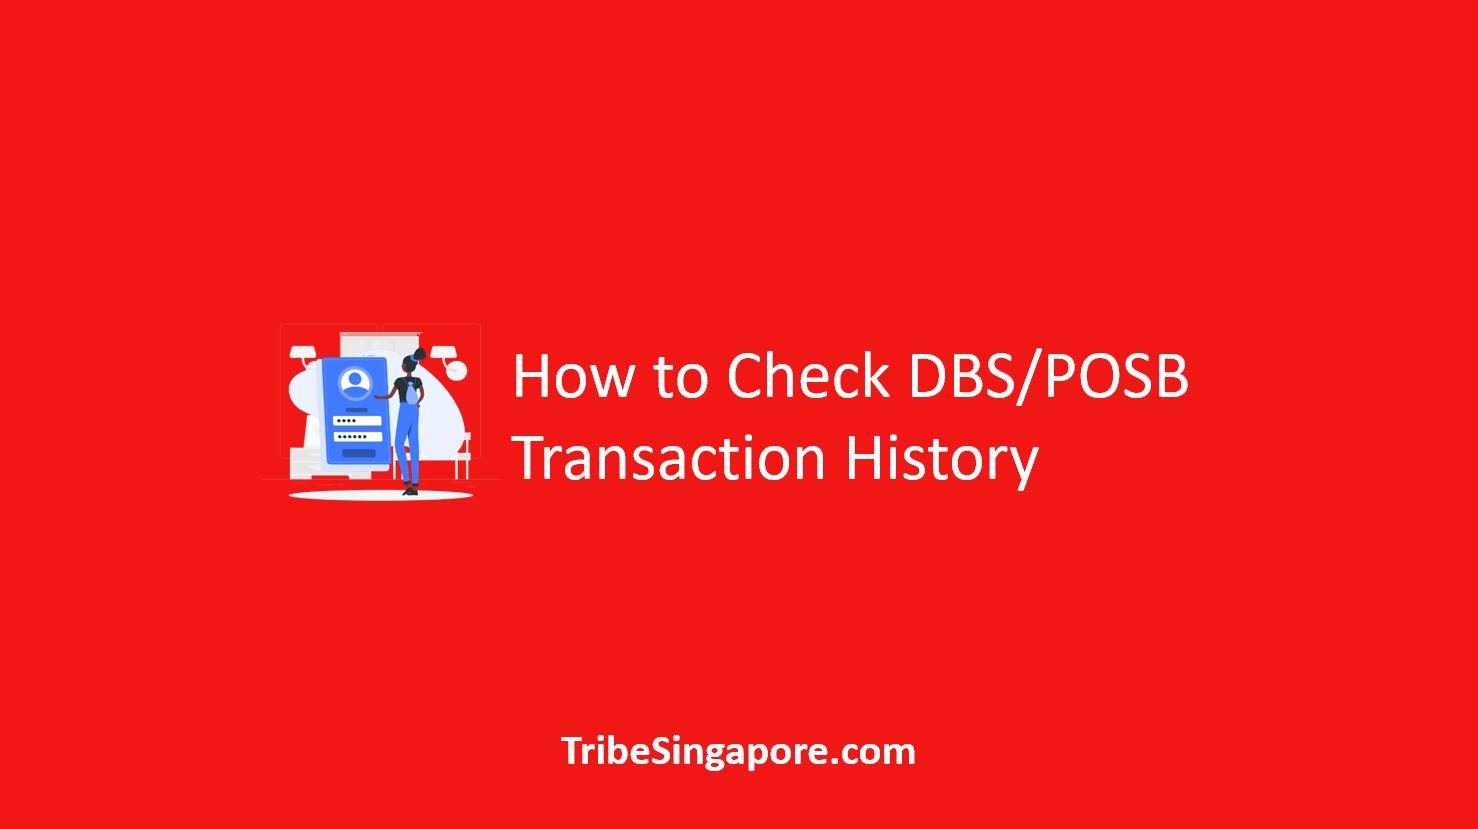 How to Check DBS/POSB Transaction History